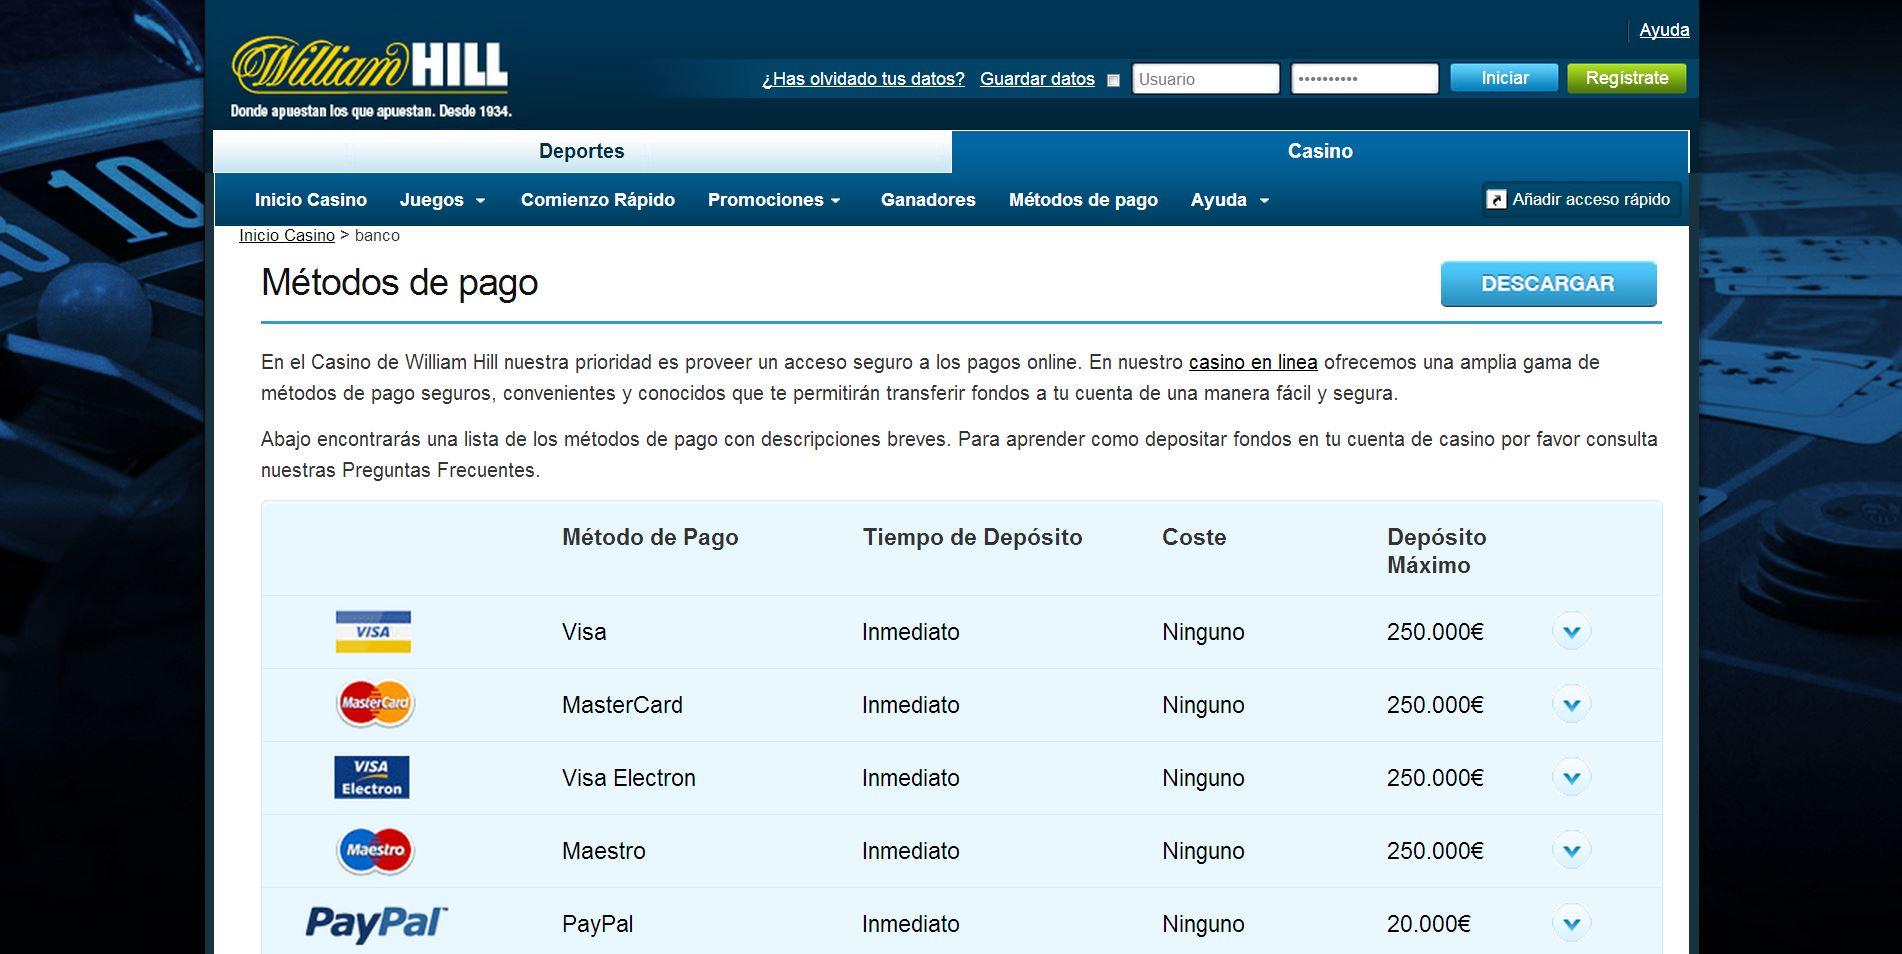 William hill international mejores casino Paraguay - 29810